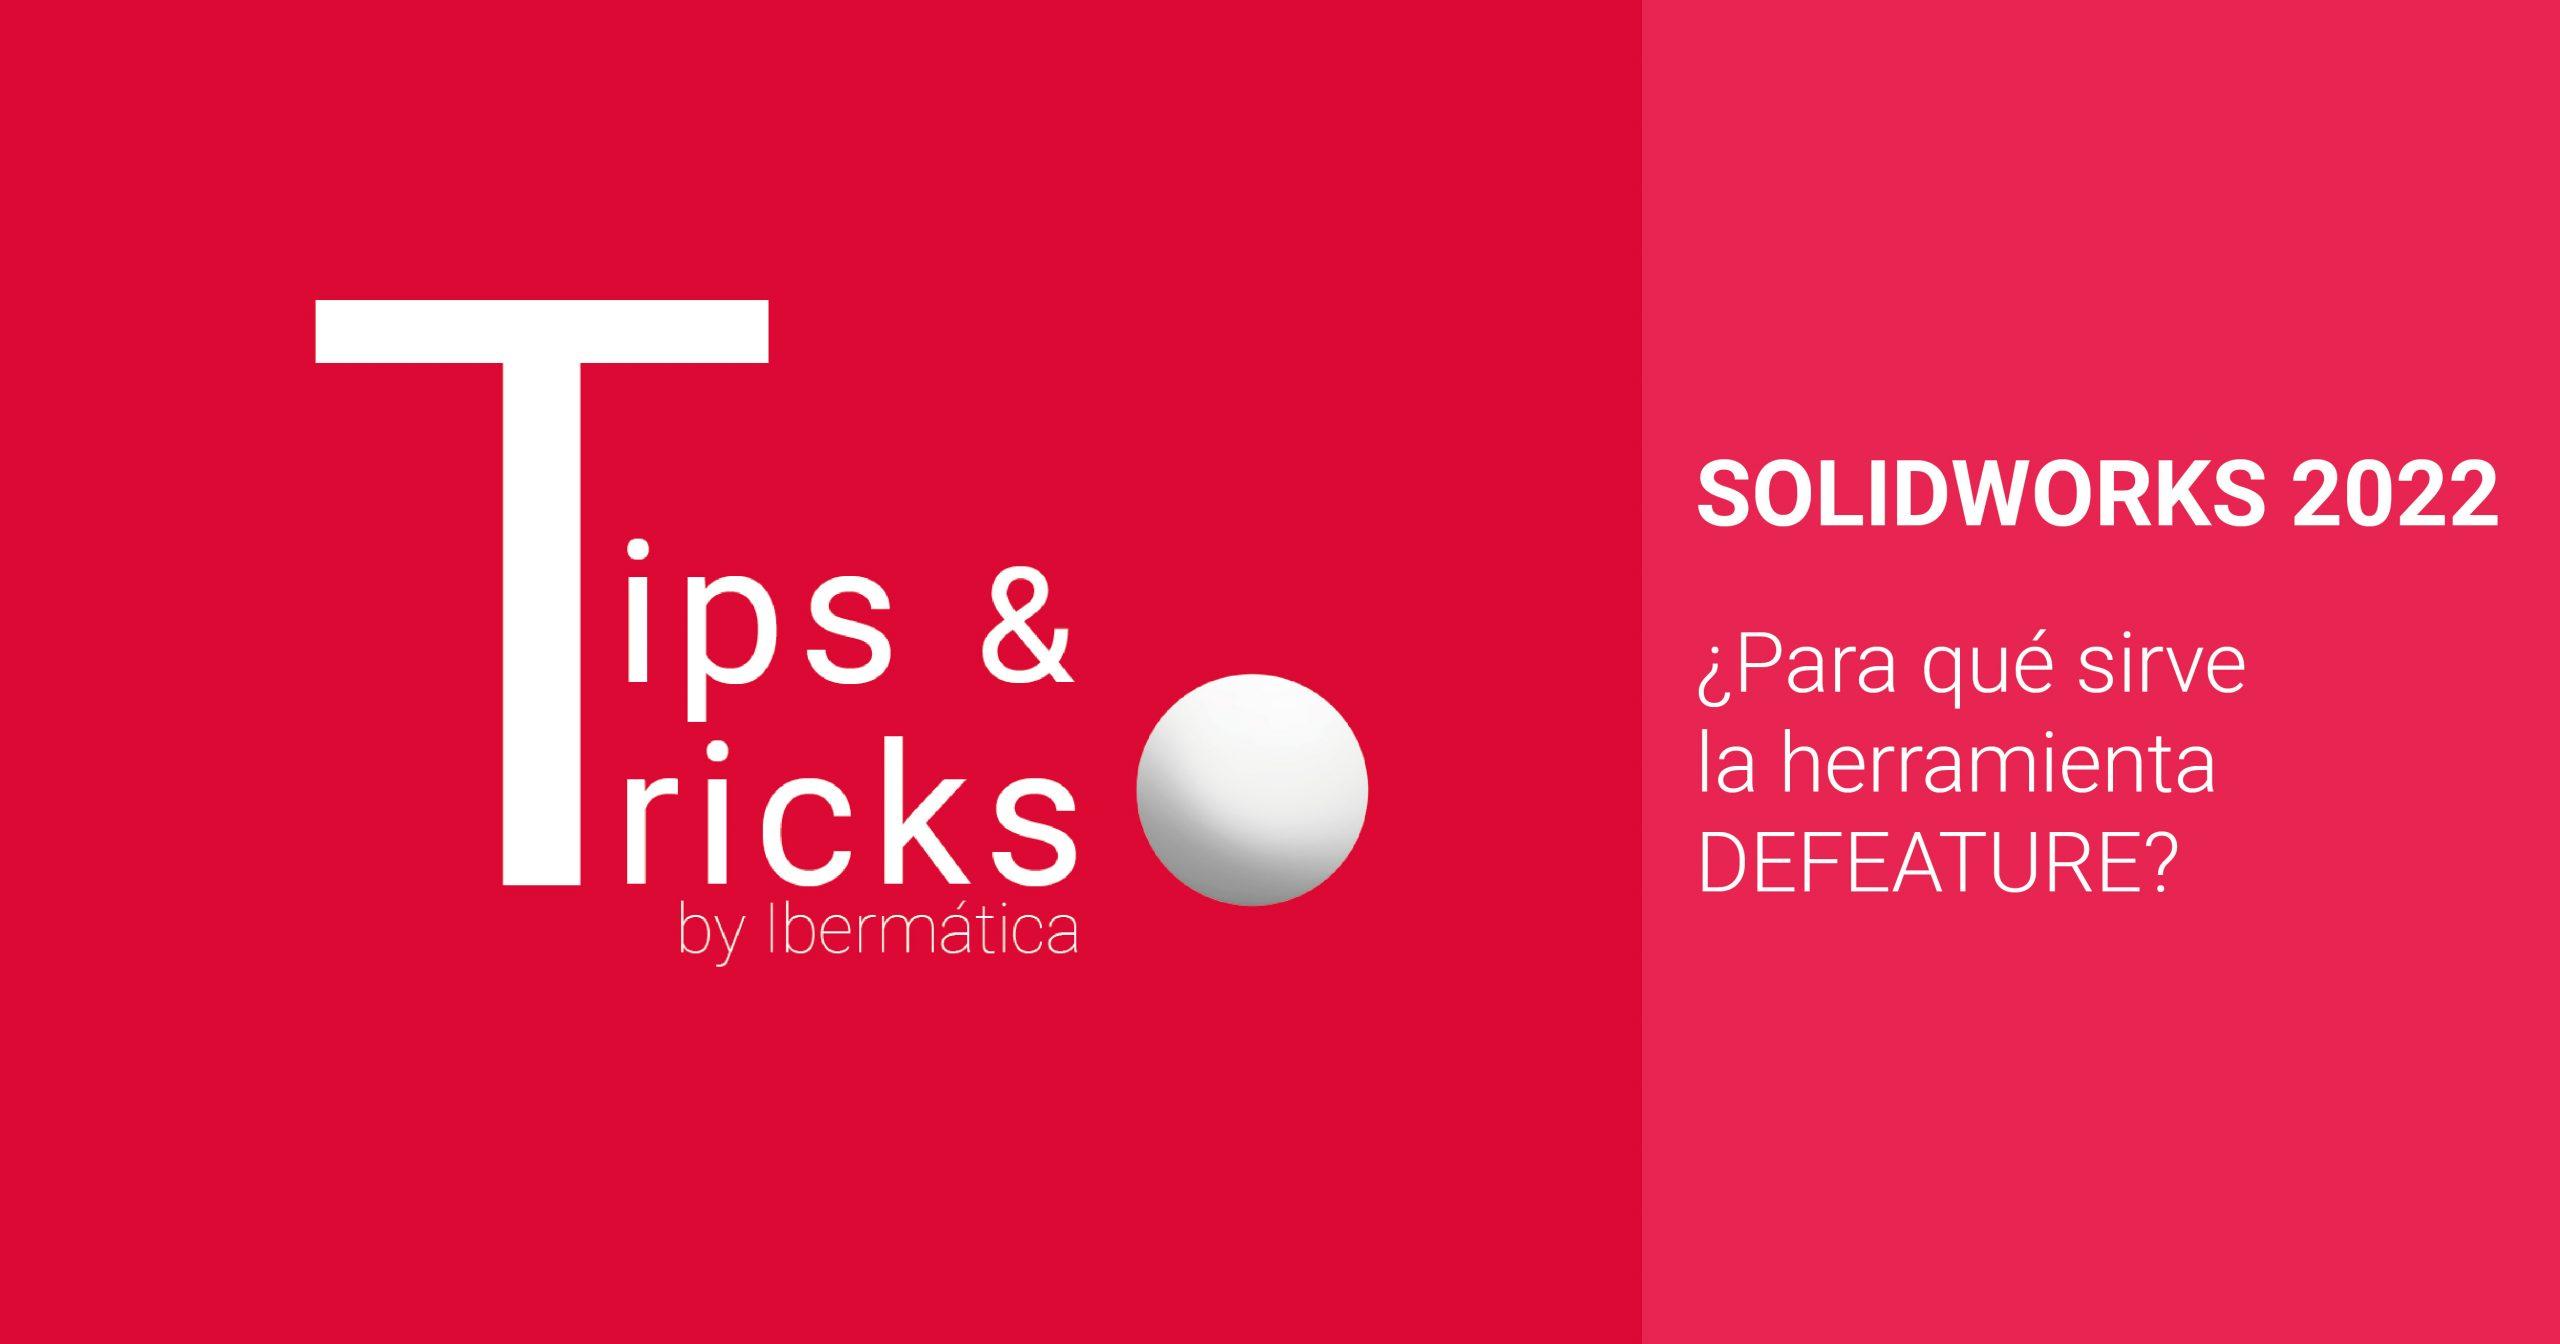 solidworks defeature